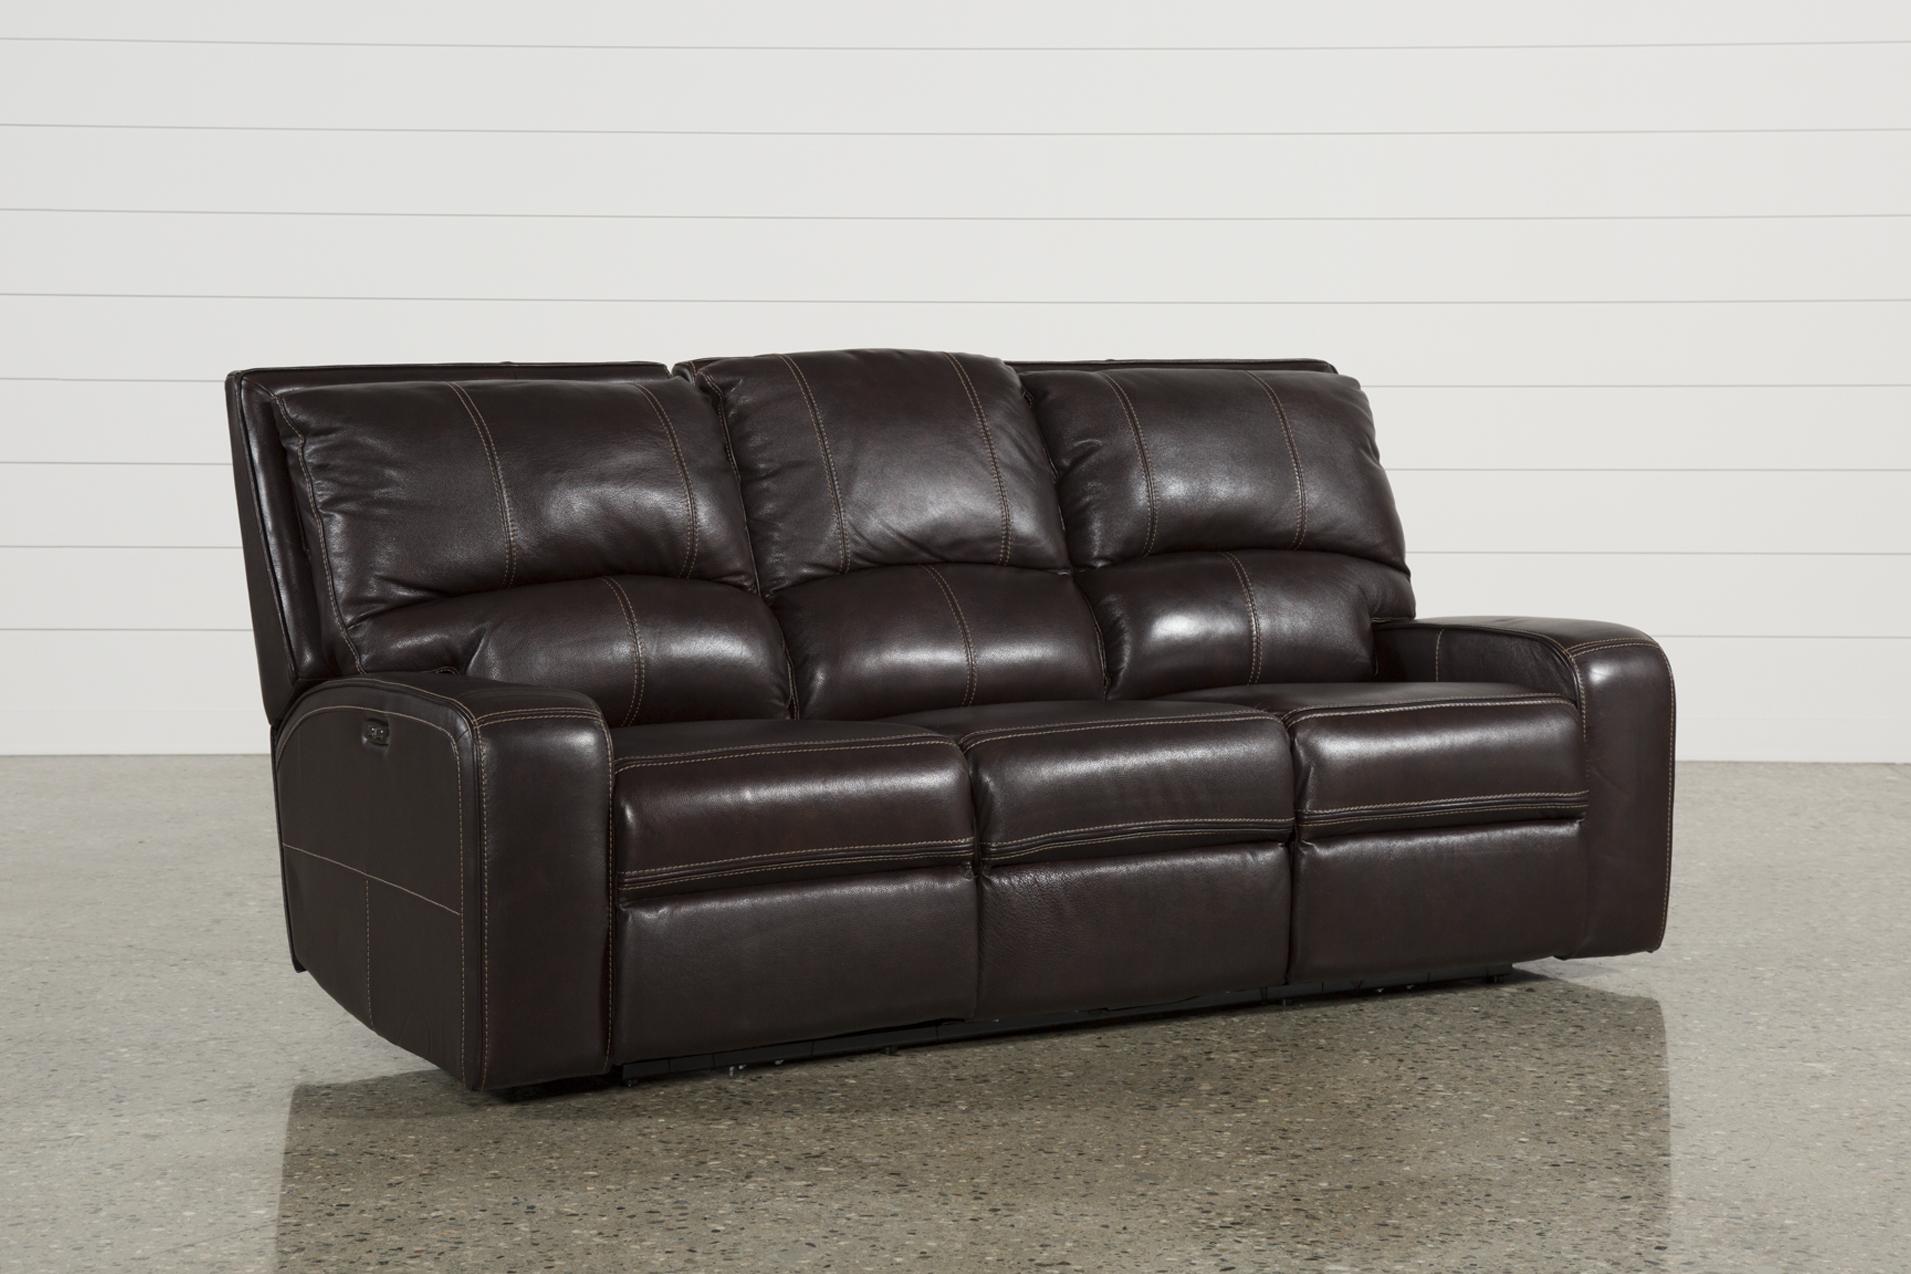 clyde dark brown leather power reclining sofa w power headrest usb rh livingspaces com brown leather reclining couch light brown leather reclining sofa